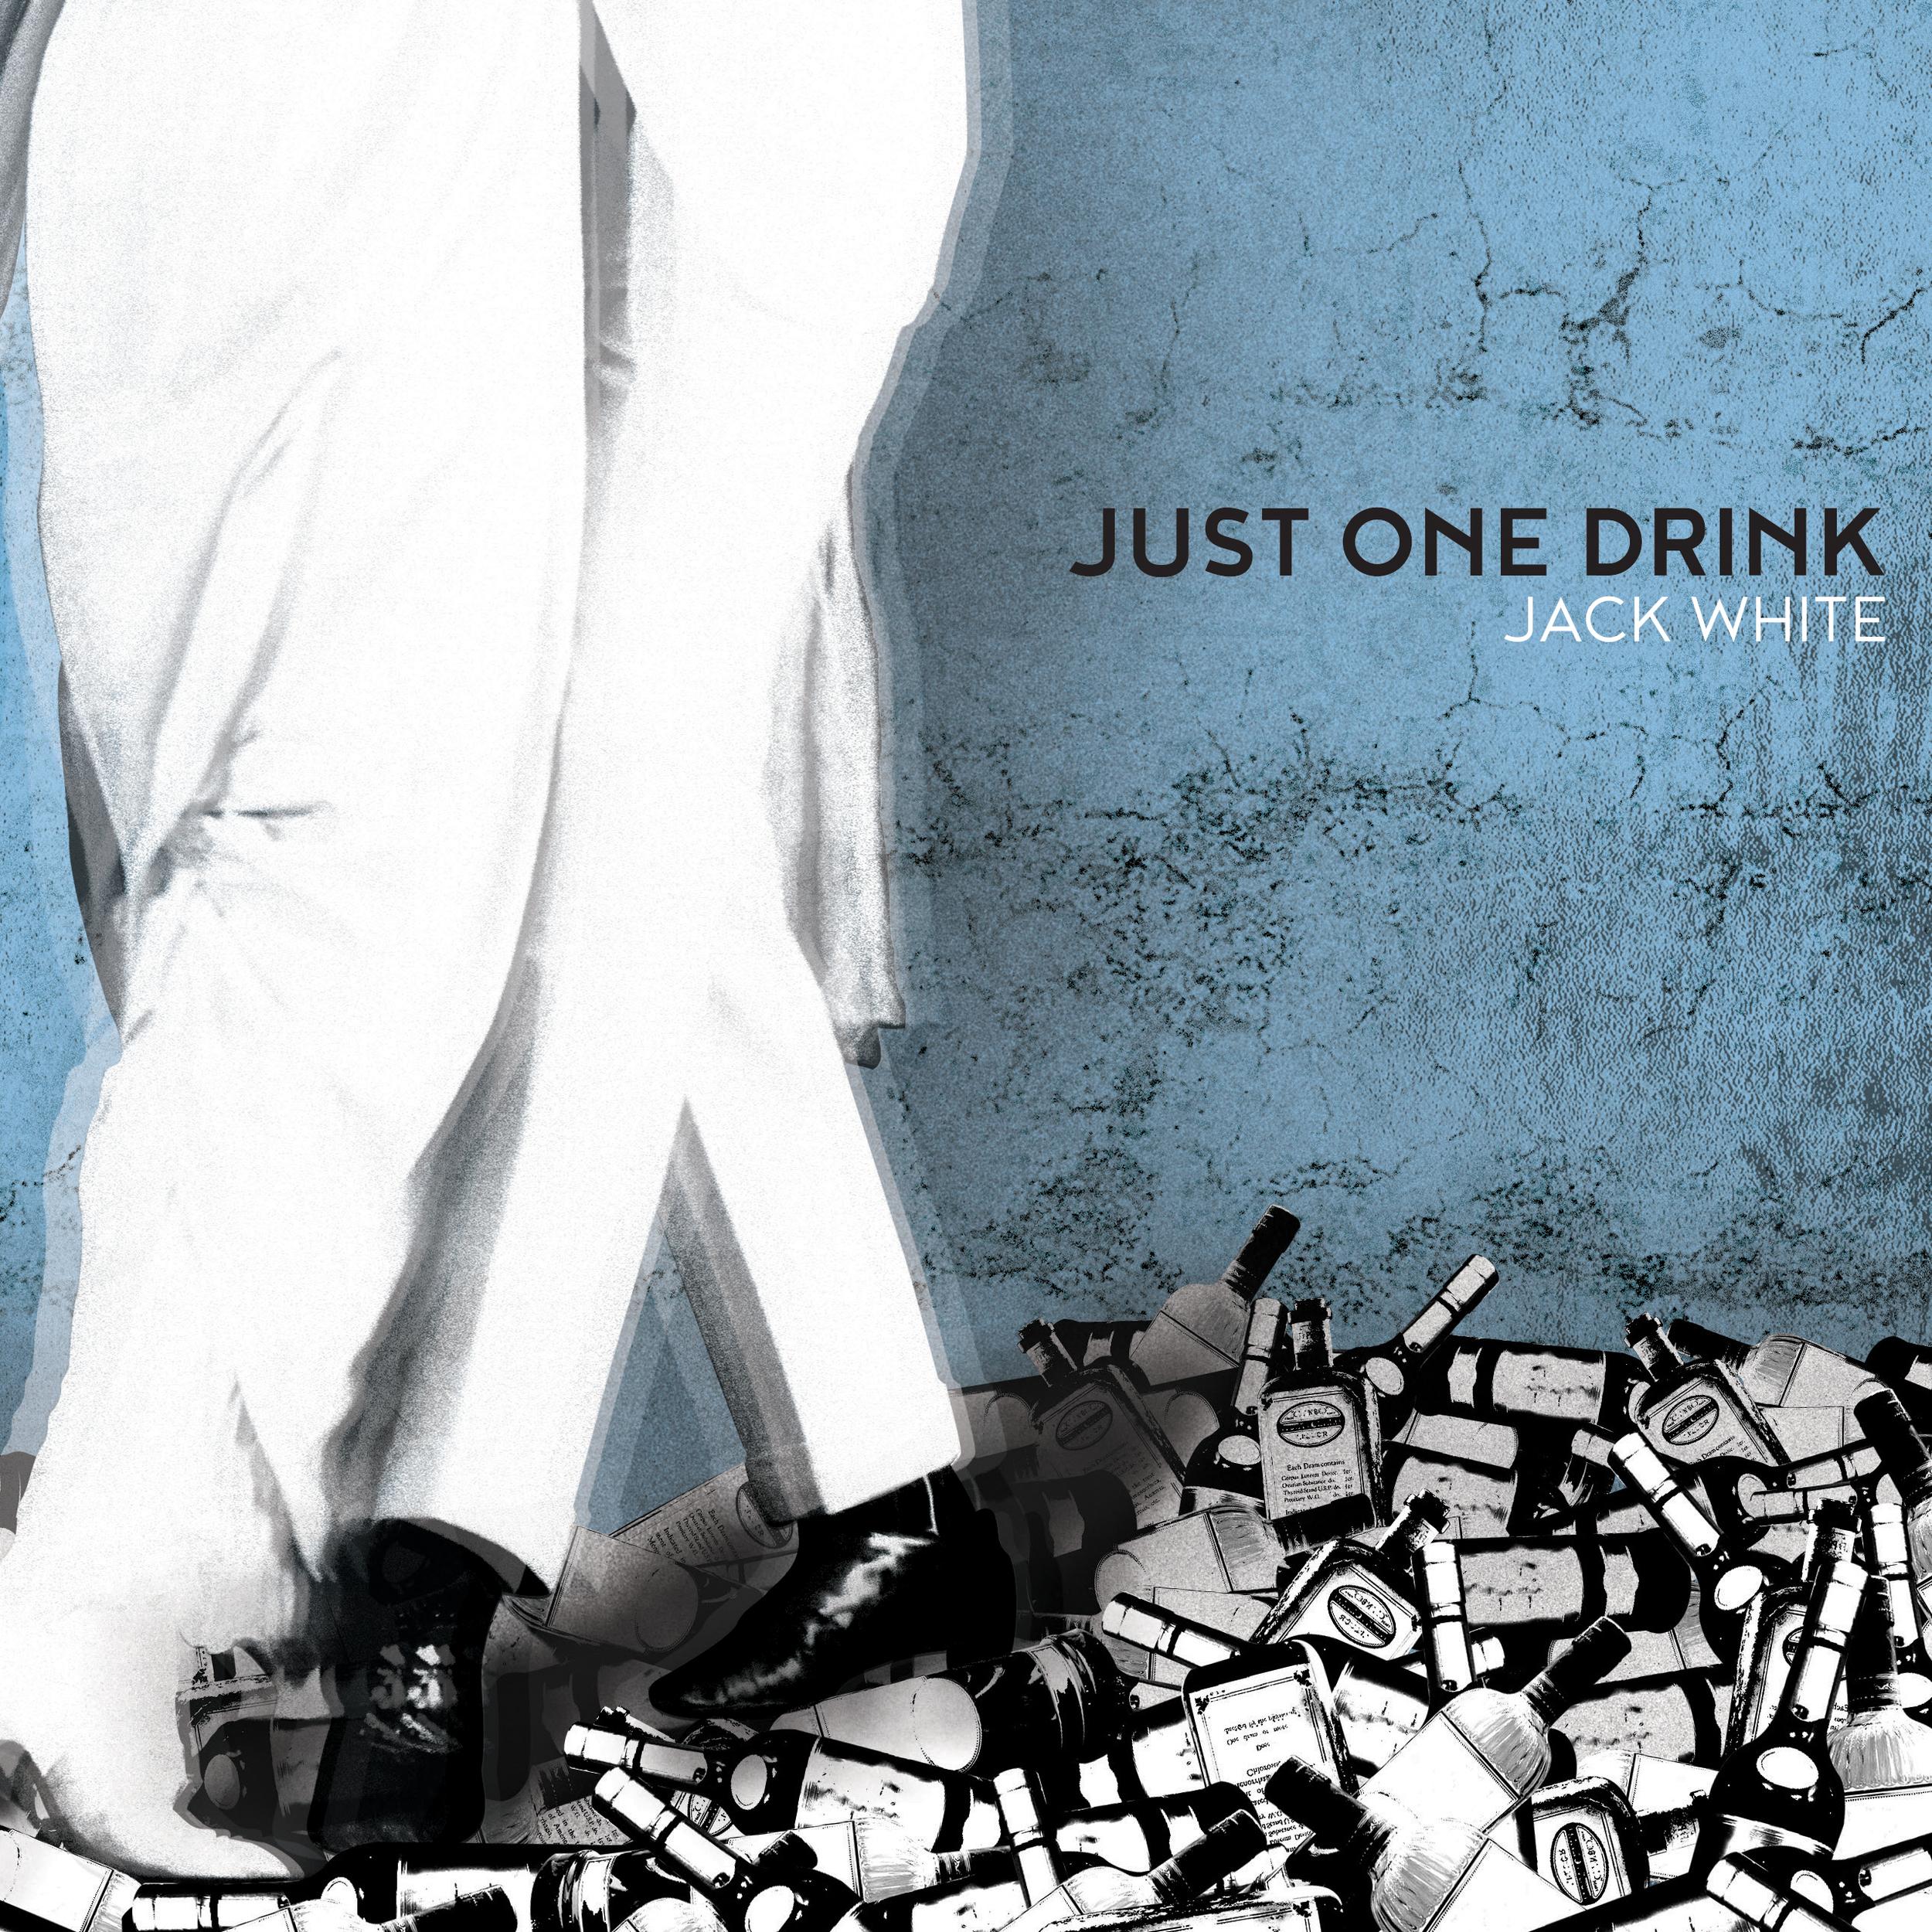 AIGA Always Summer Poster Show 2015: Jack White